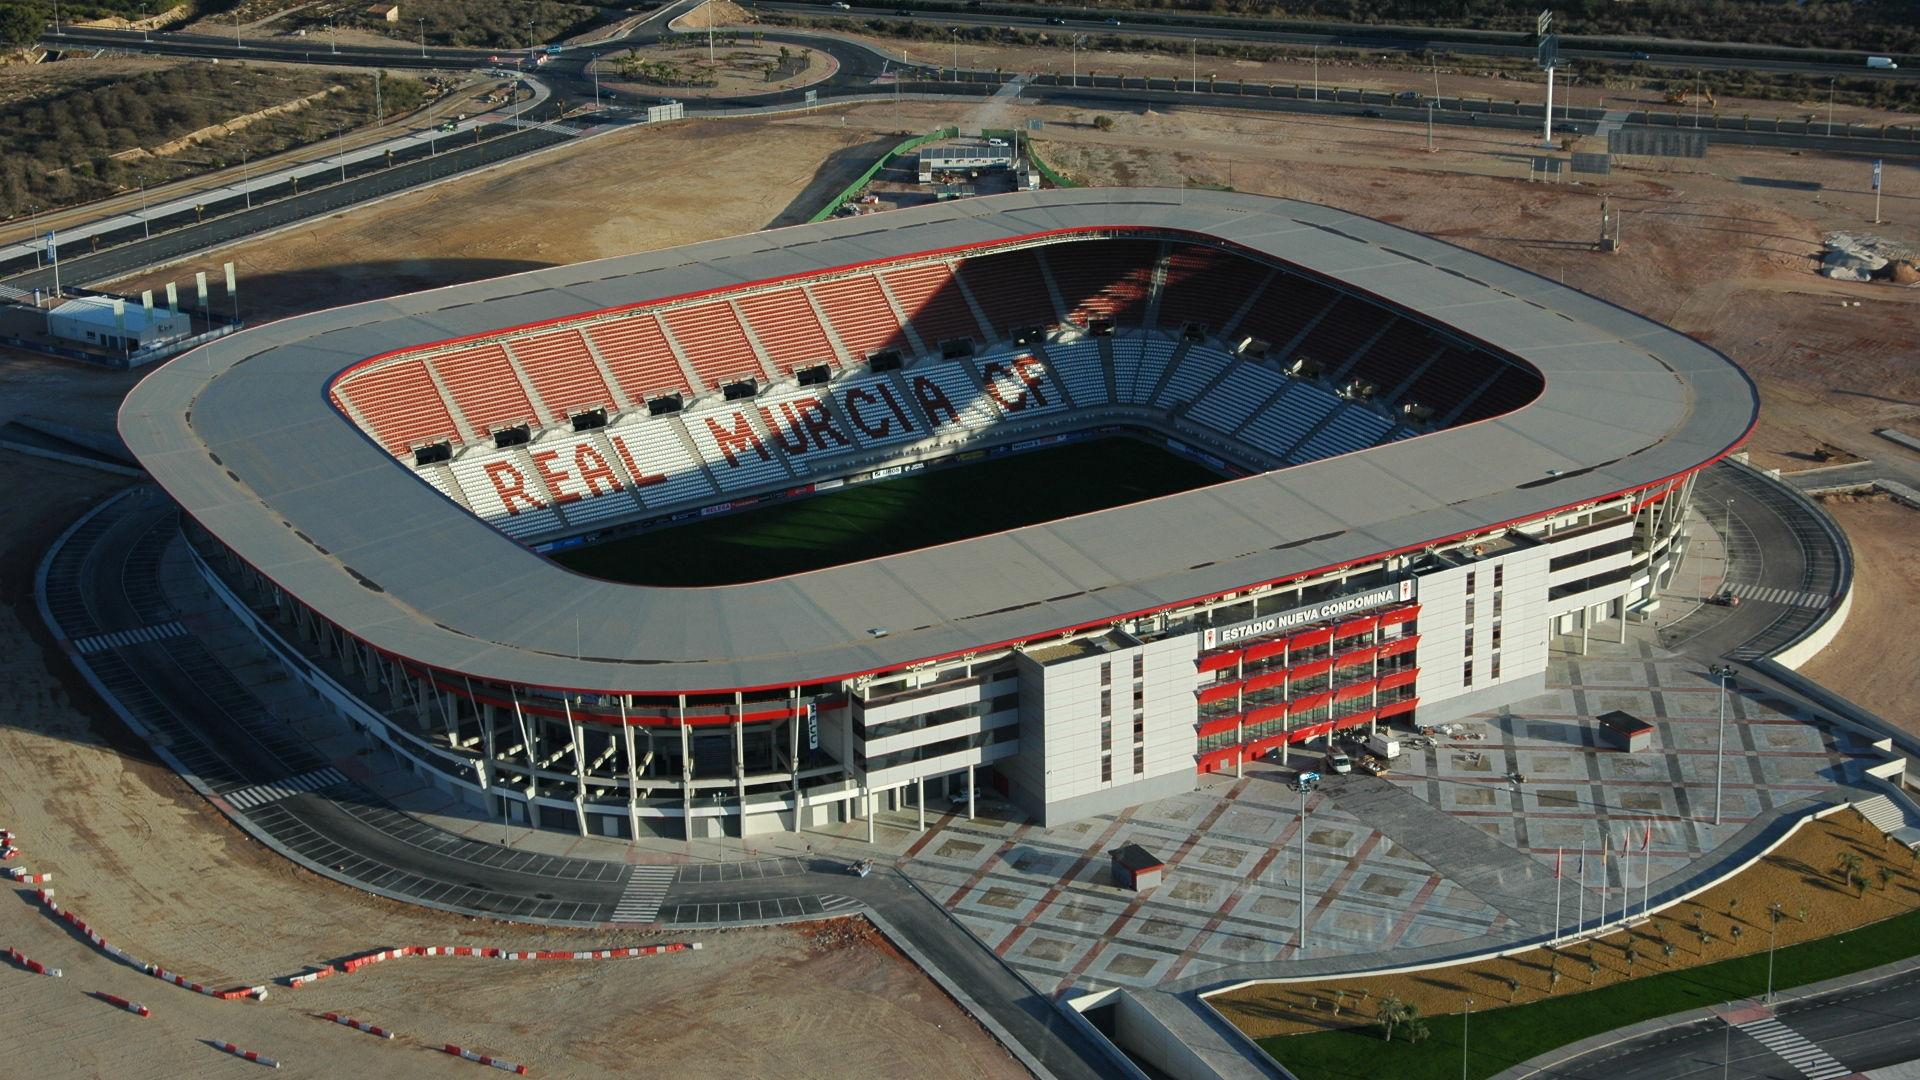 Football grounds in Spain. Nueva-condomina